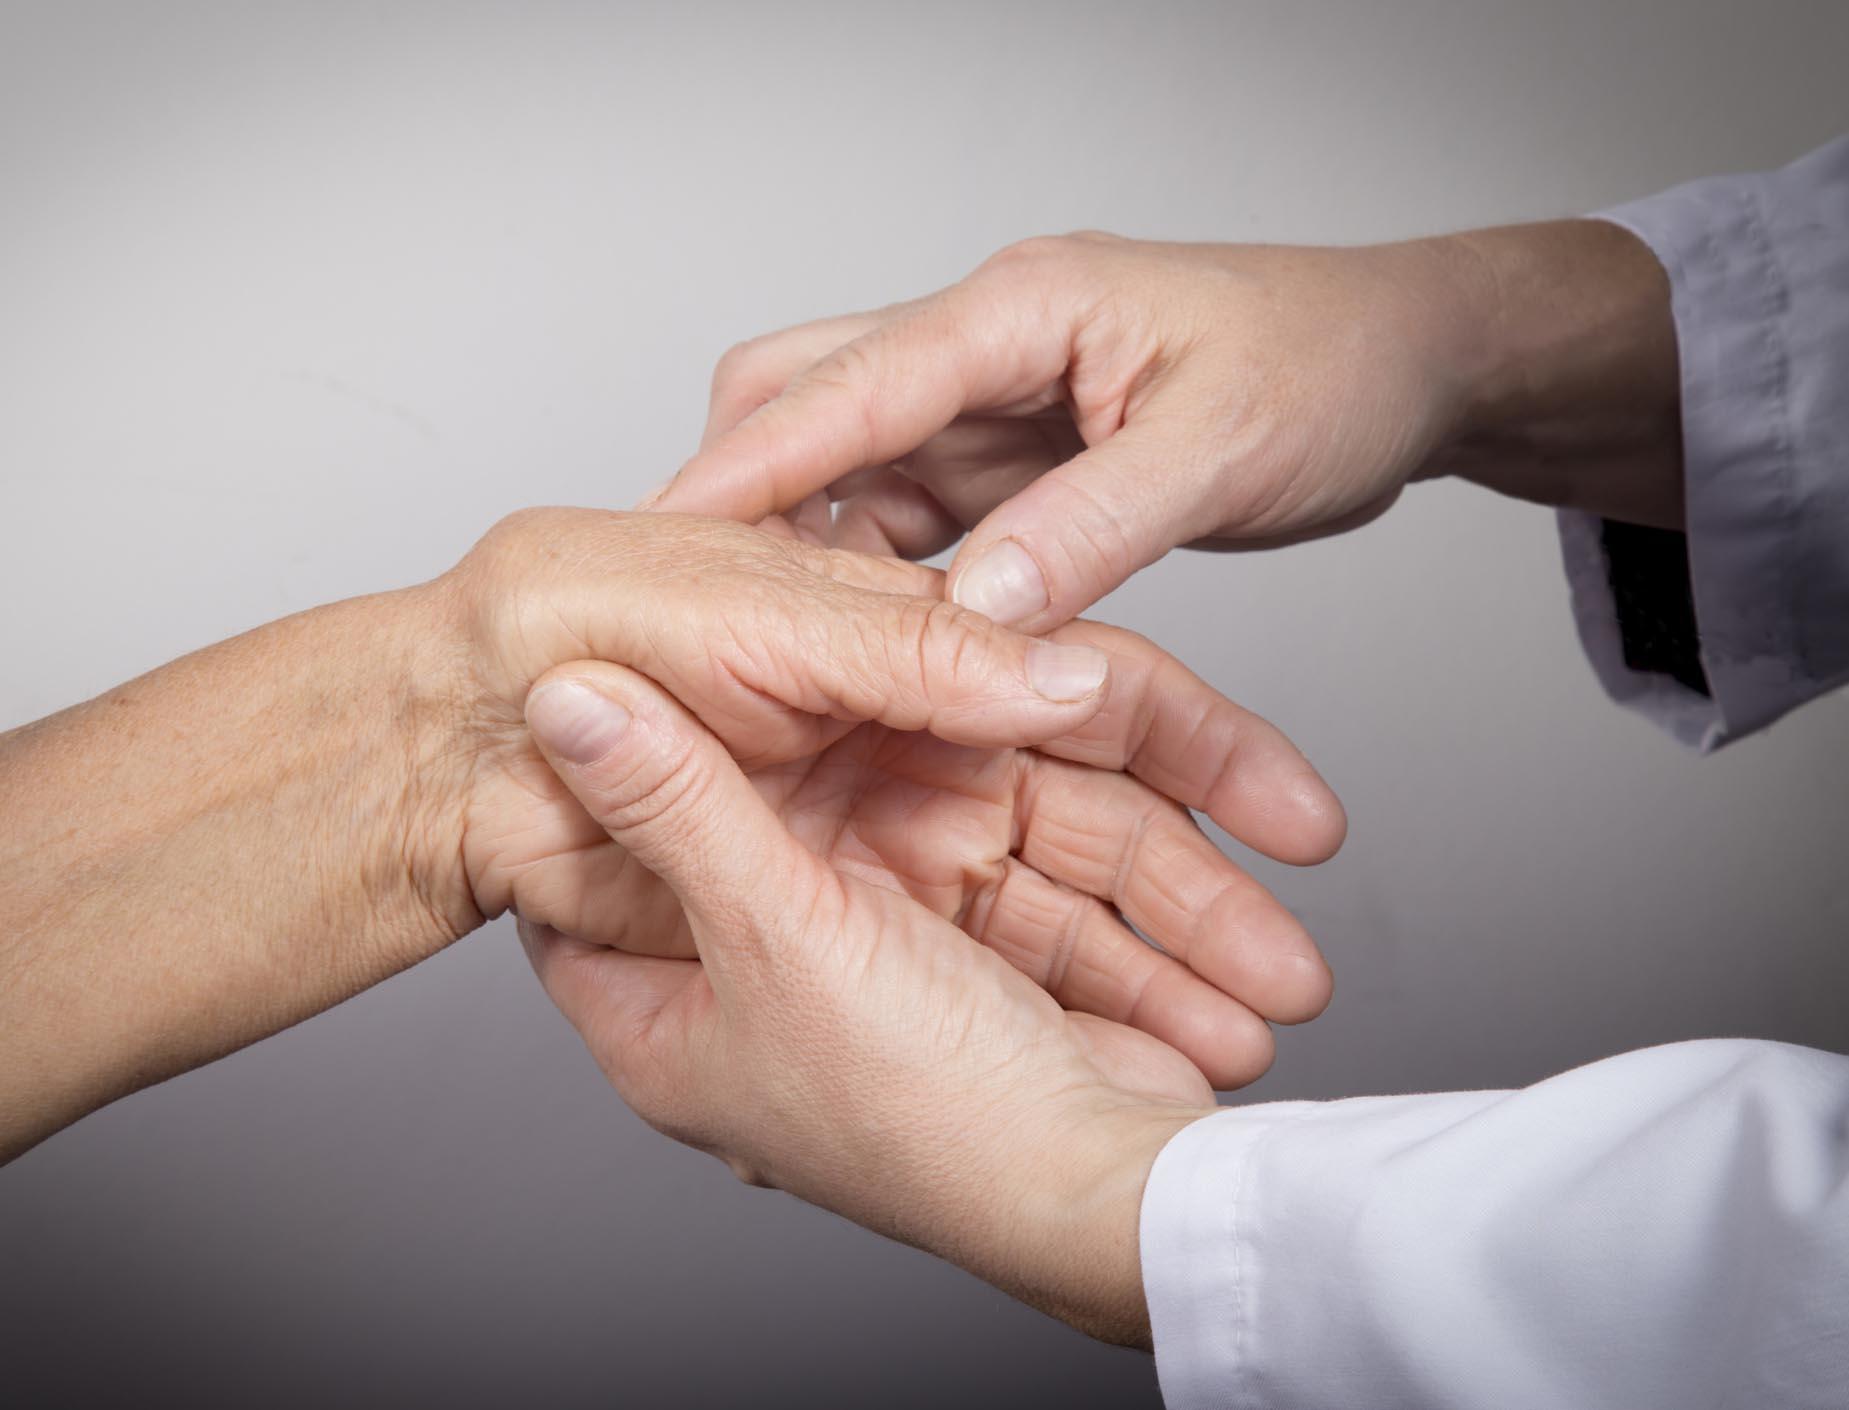 Fibromyalgie cause : La fibromyalgie et si on en parlait aujourd'hui ?